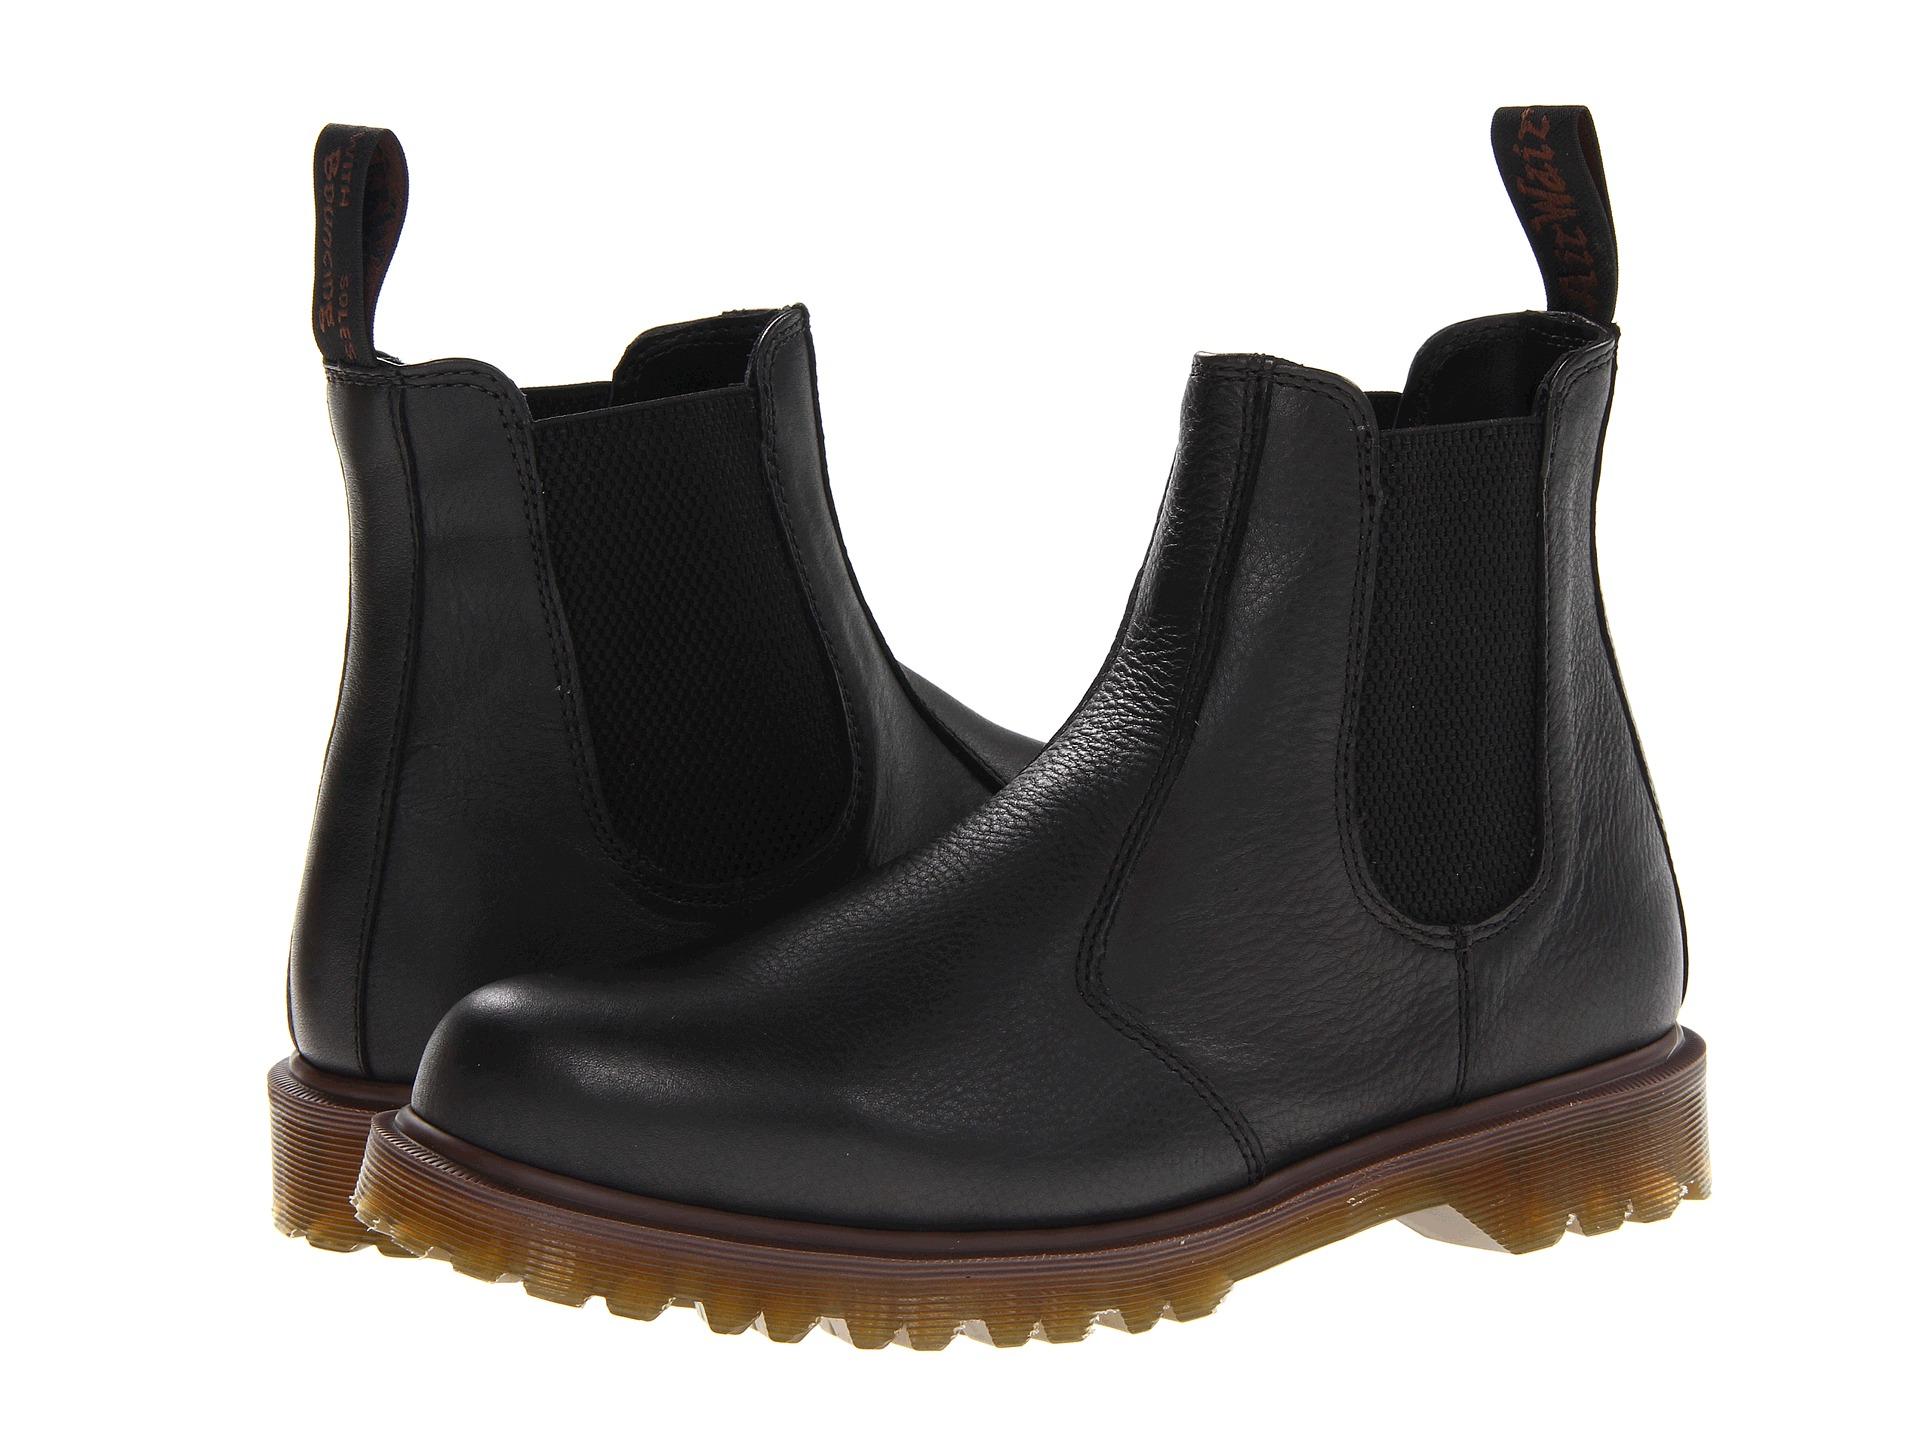 dr martens 2976 chelsea boot free shipping both ways. Black Bedroom Furniture Sets. Home Design Ideas